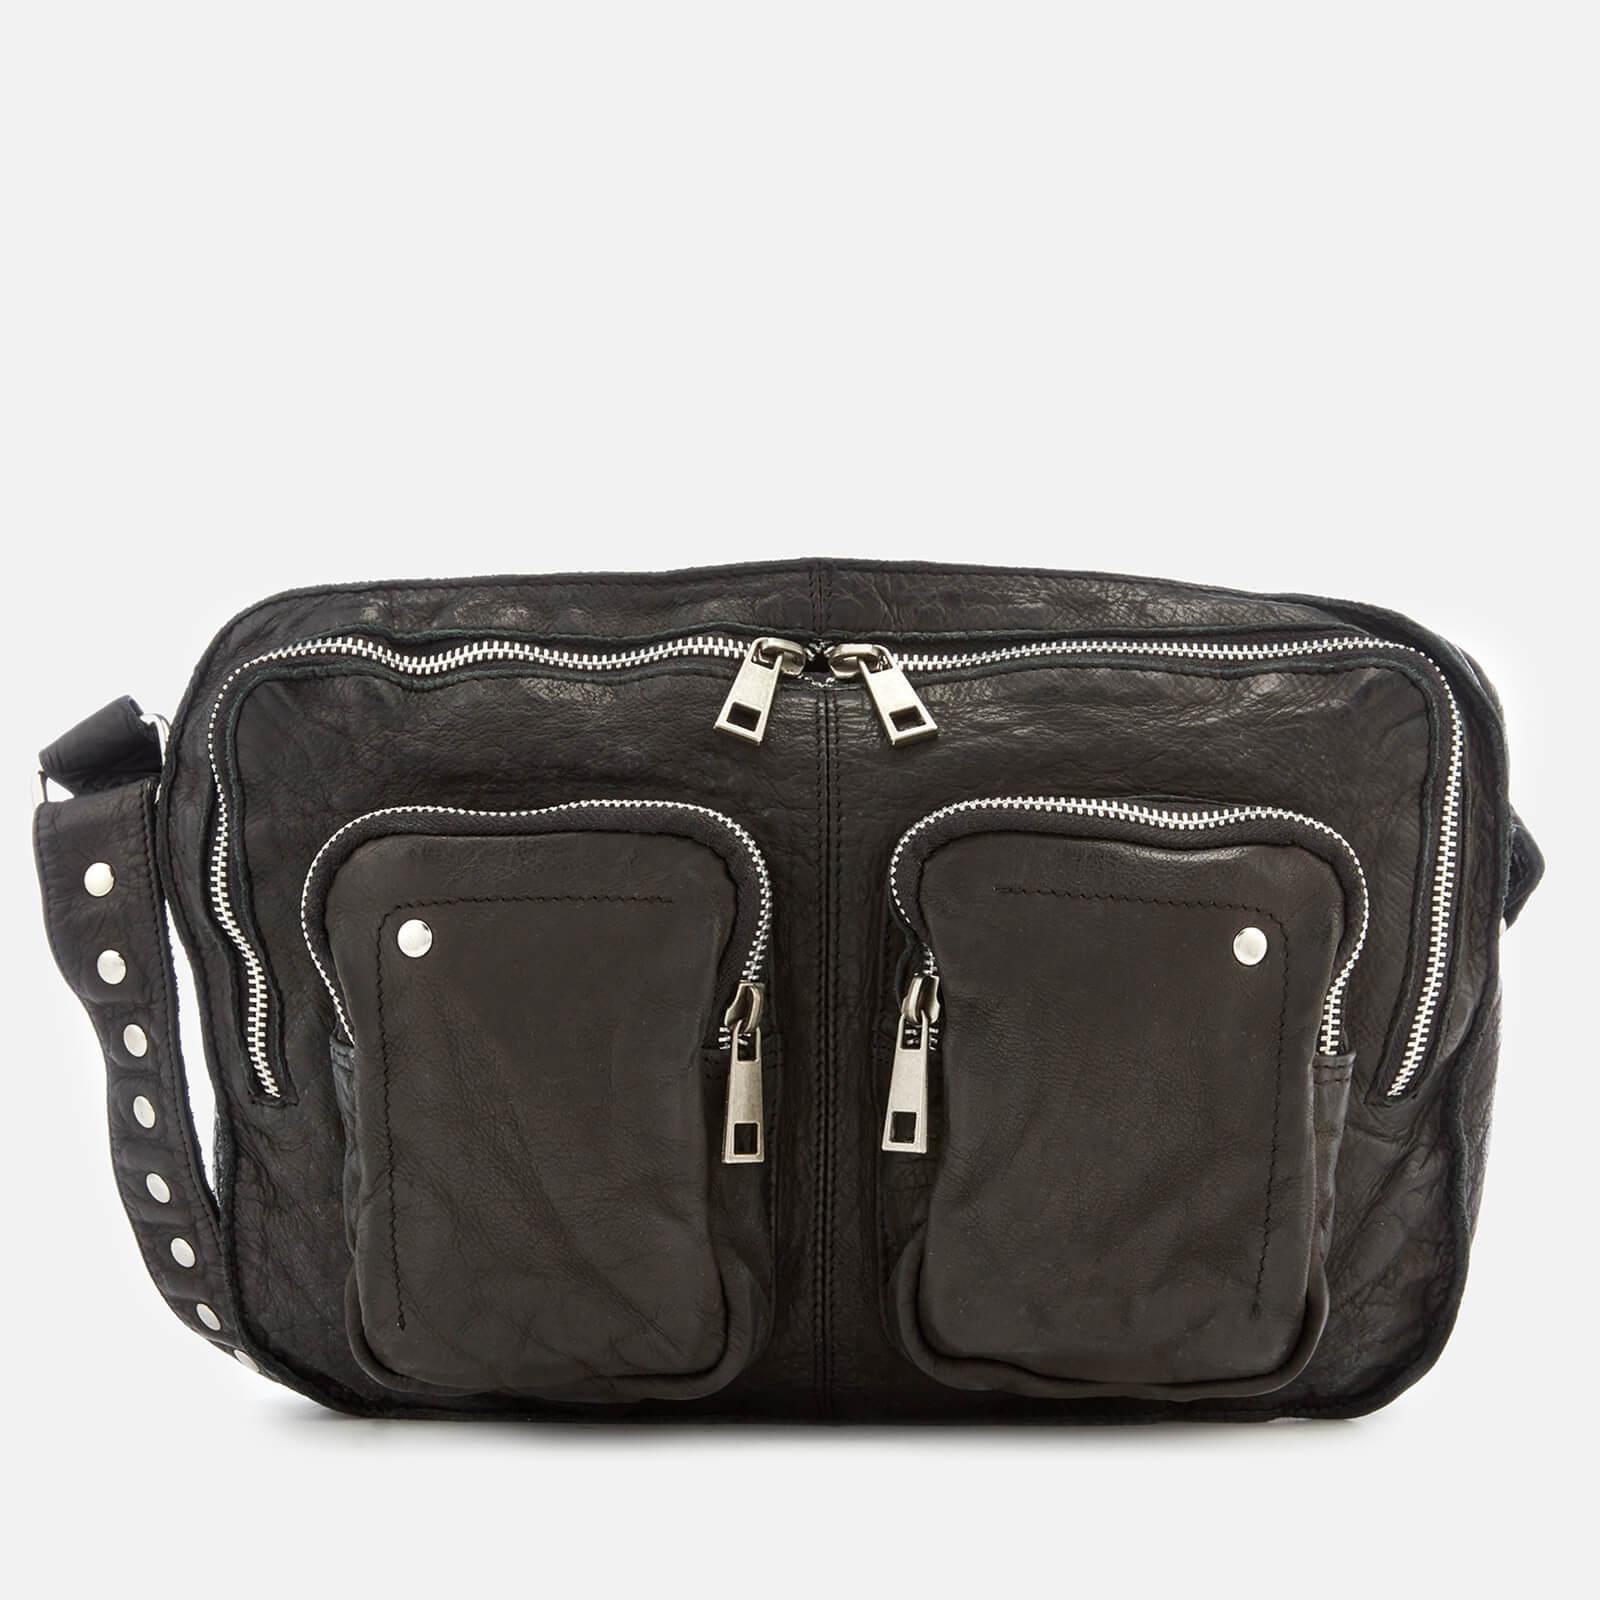 Núnoo Women's Mia Bag - Black